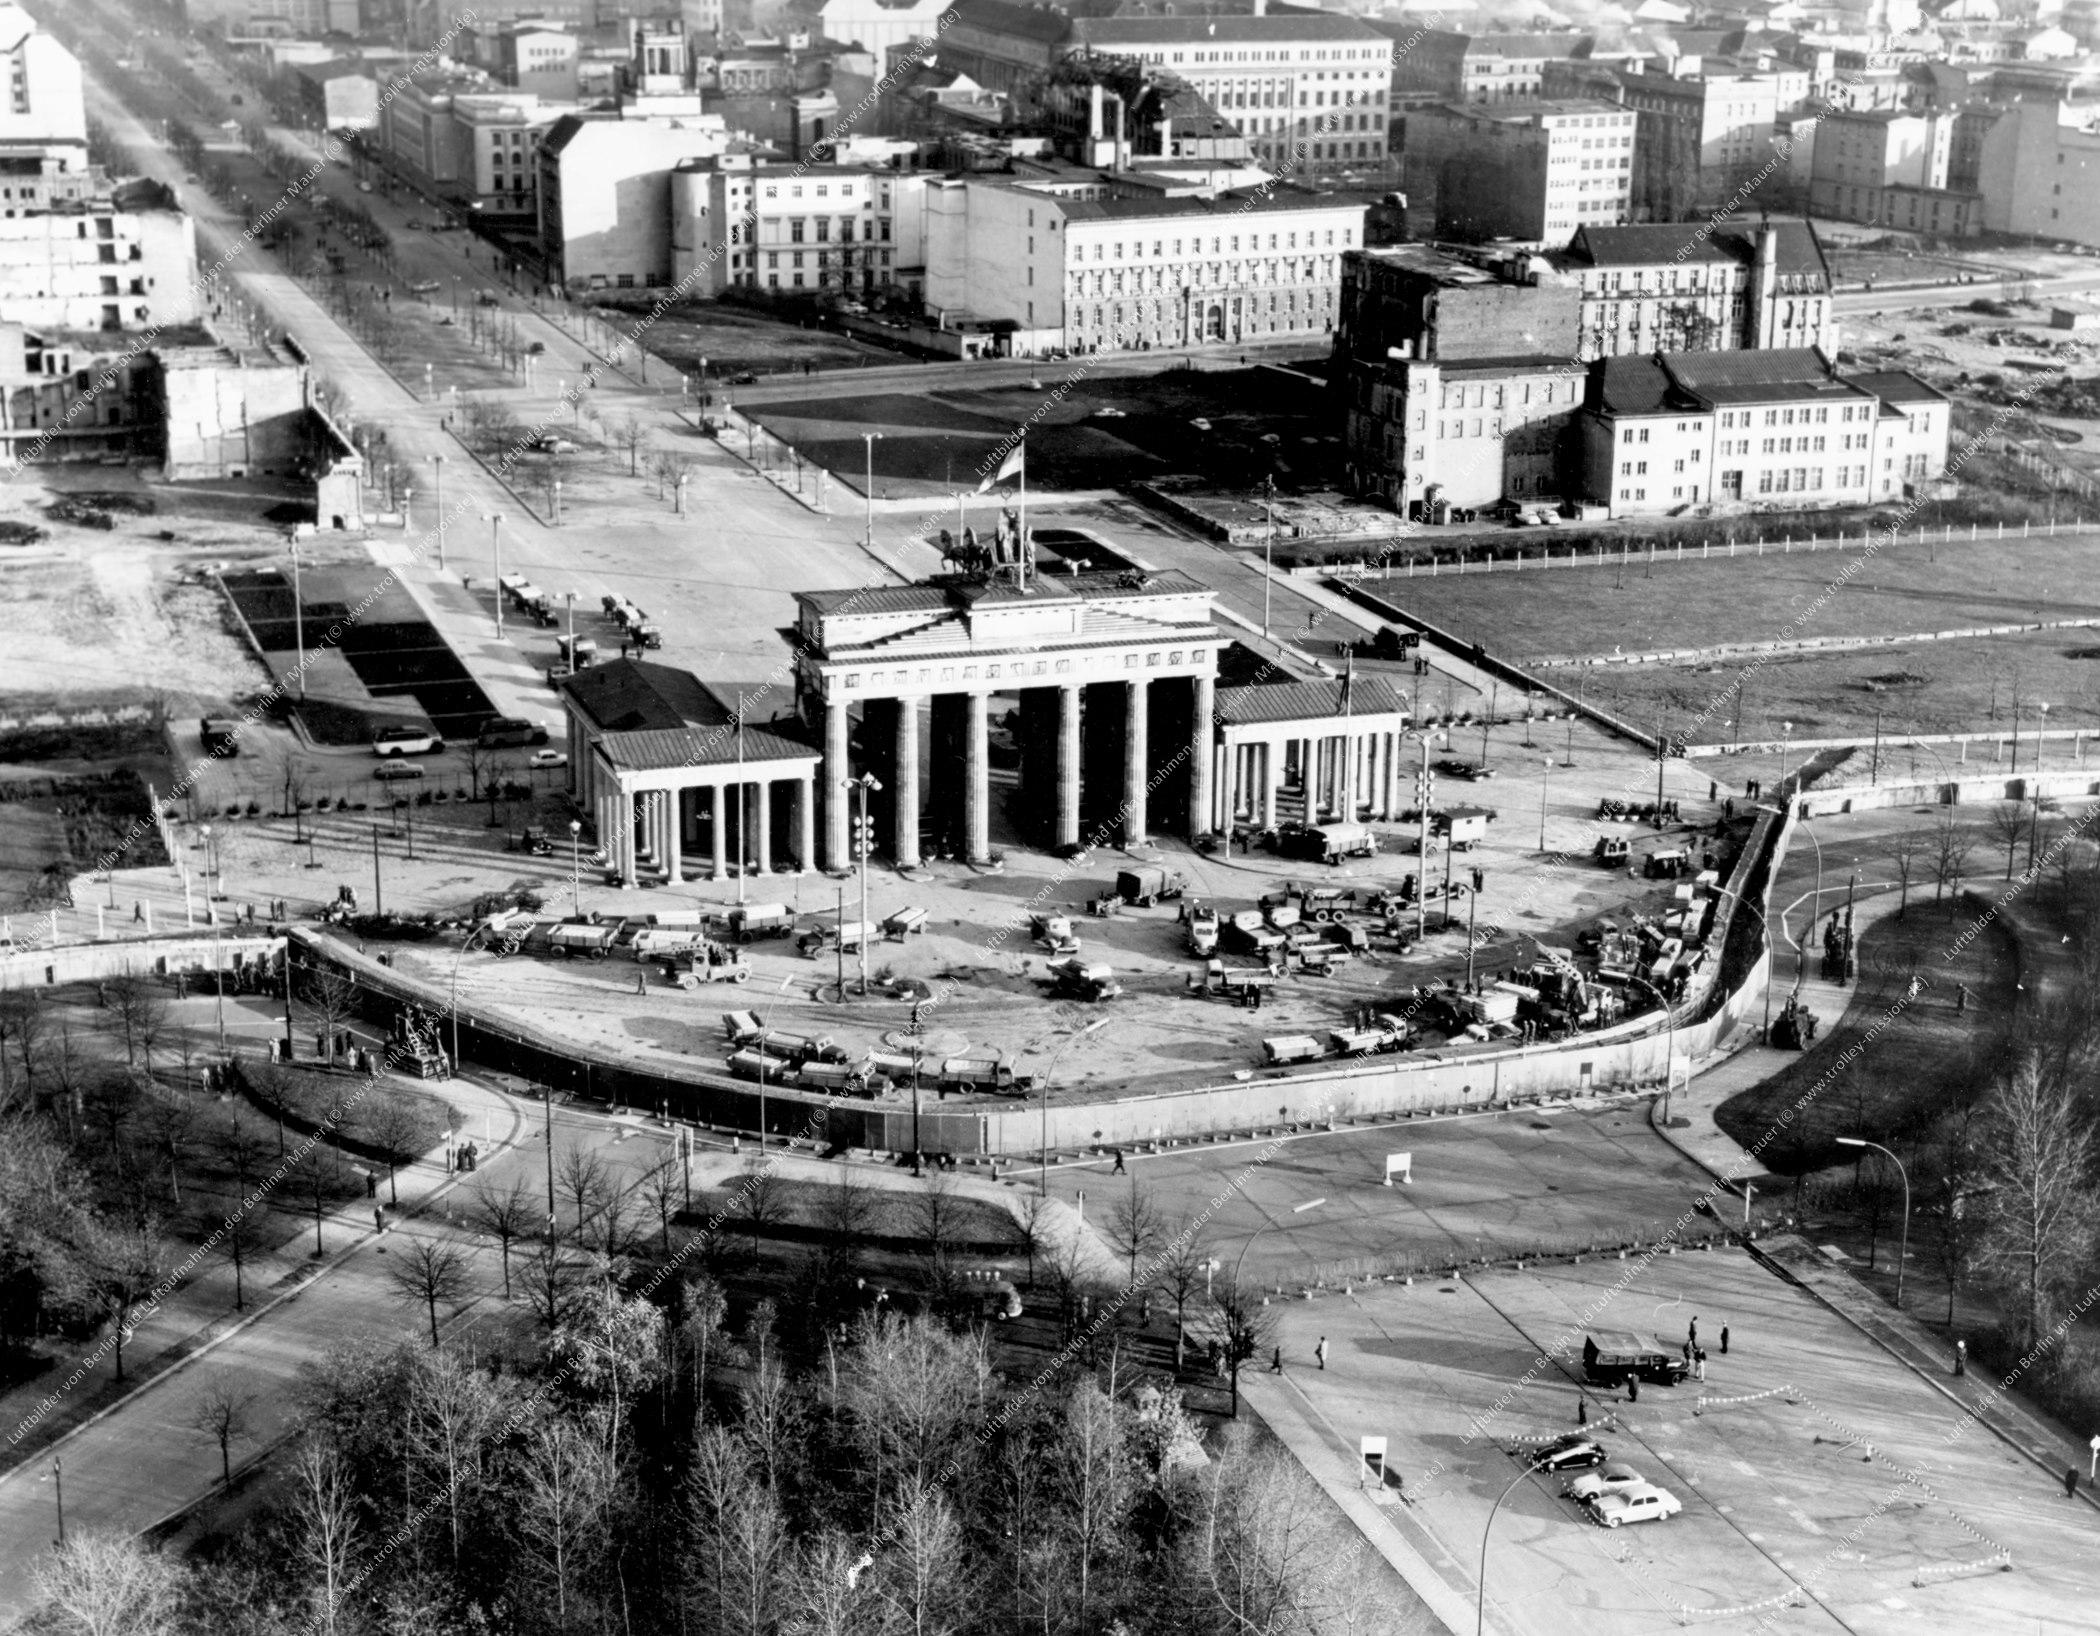 Berlin Luftbild Brandenburger Tor vom 30. November 1961 (Bild 020)